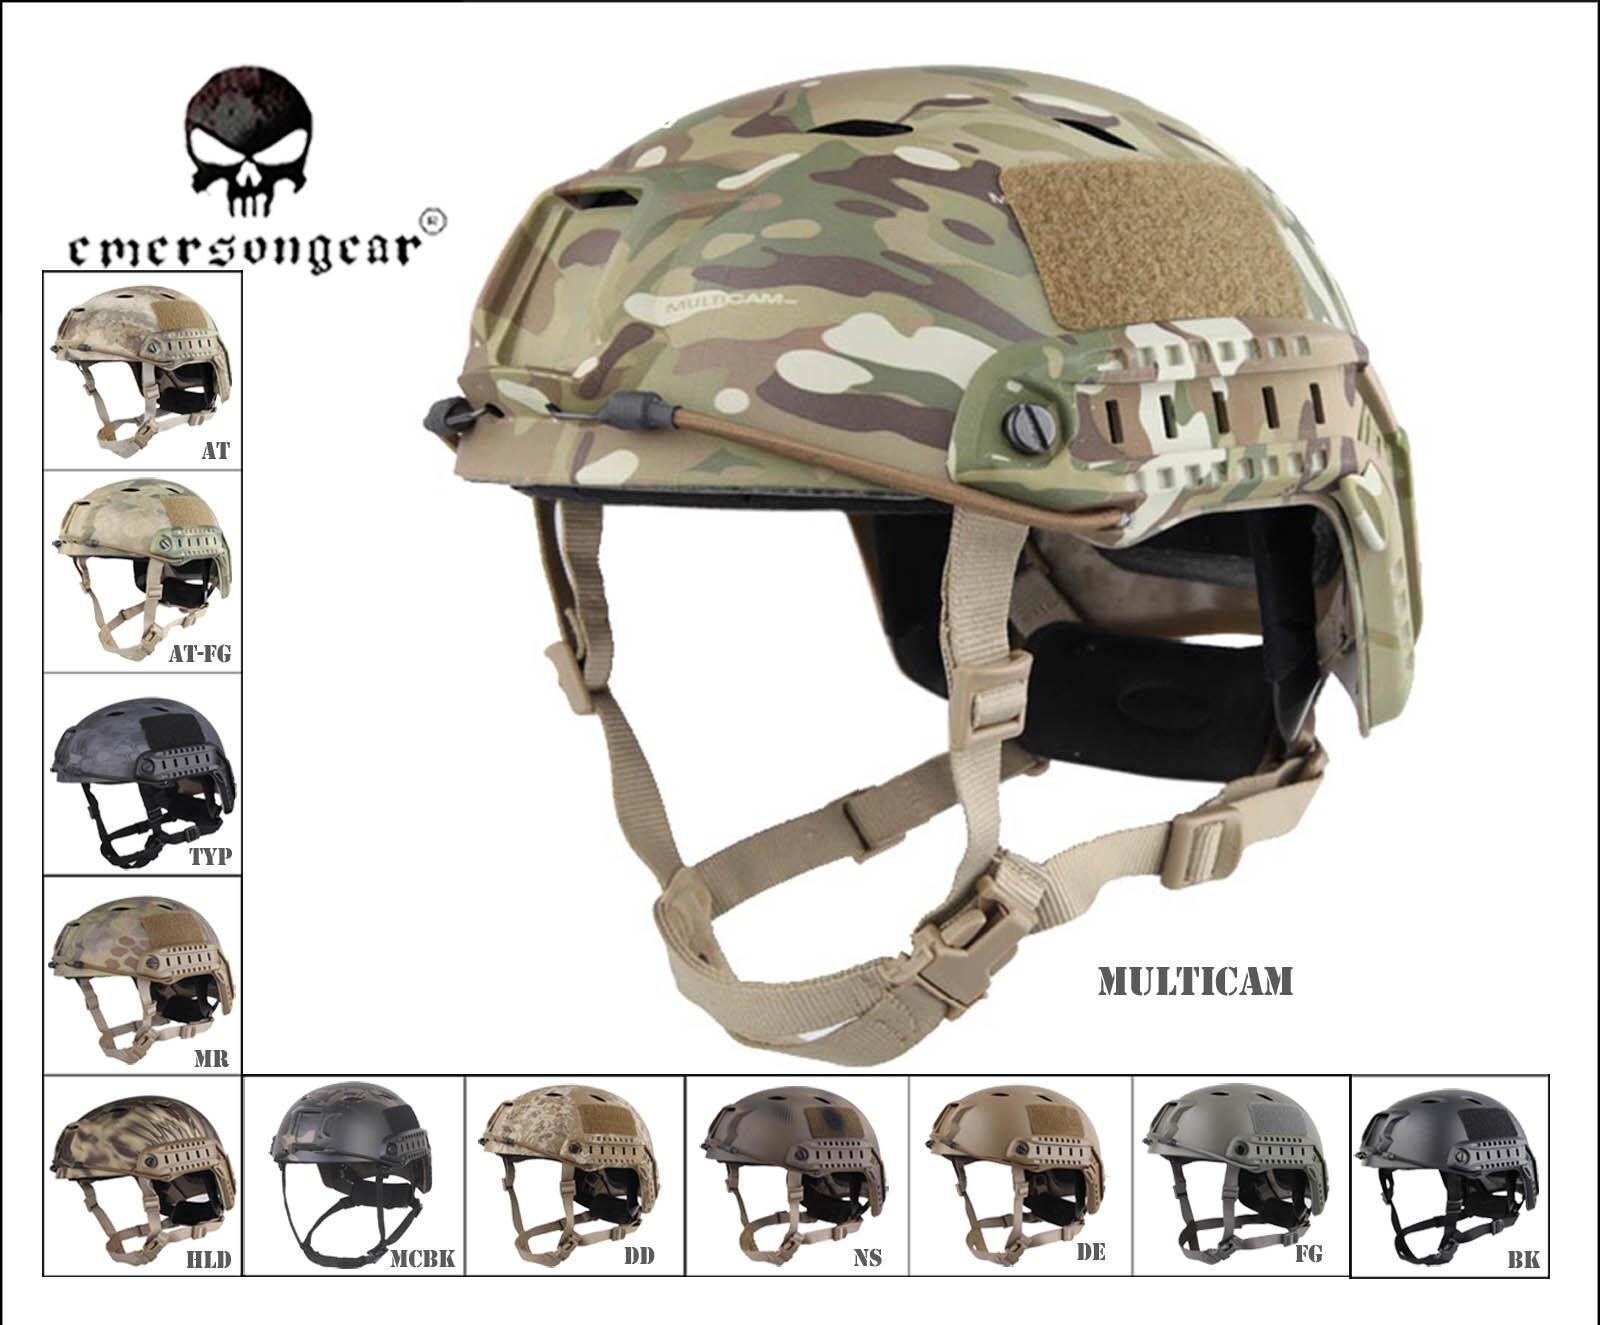 EMERSON  Military Airsoft Helmet Combat Fast Helmet BJ Predective Helmet EM5659  at the lowest price